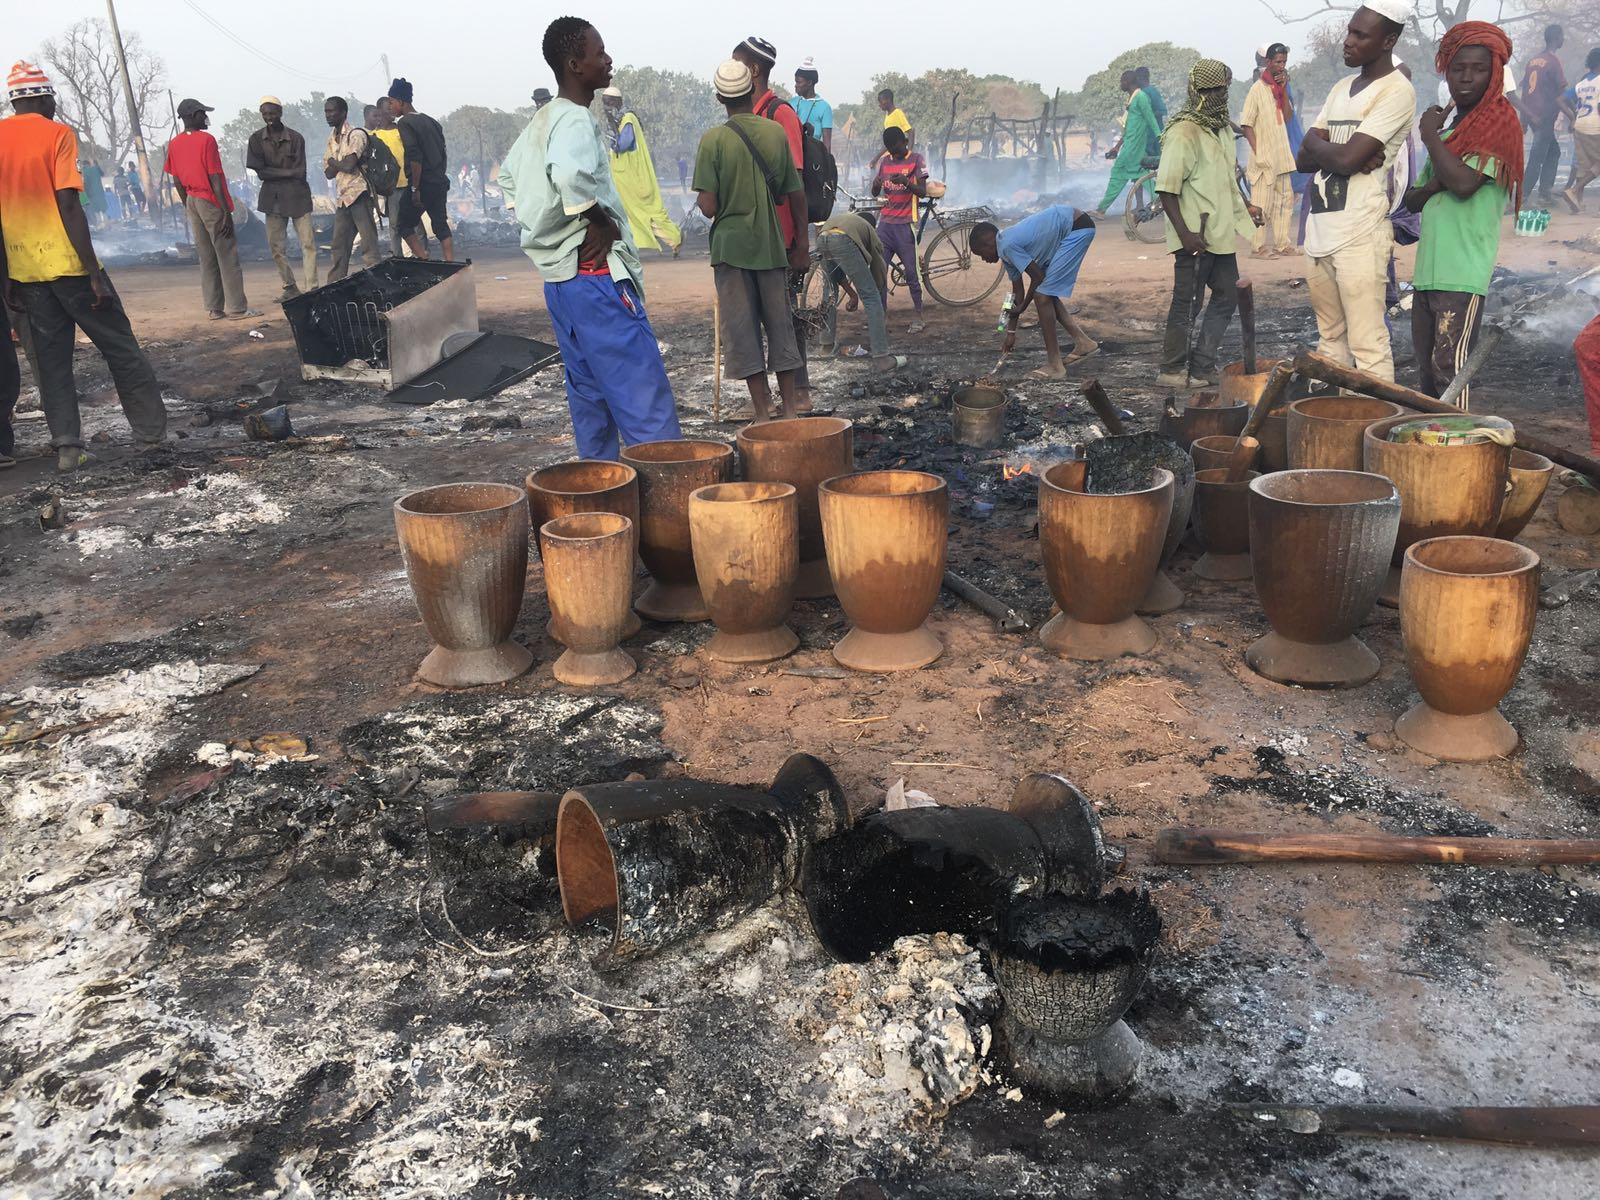 Incendie à Daaka : le bilan s'élève à 22 morts ( radio)